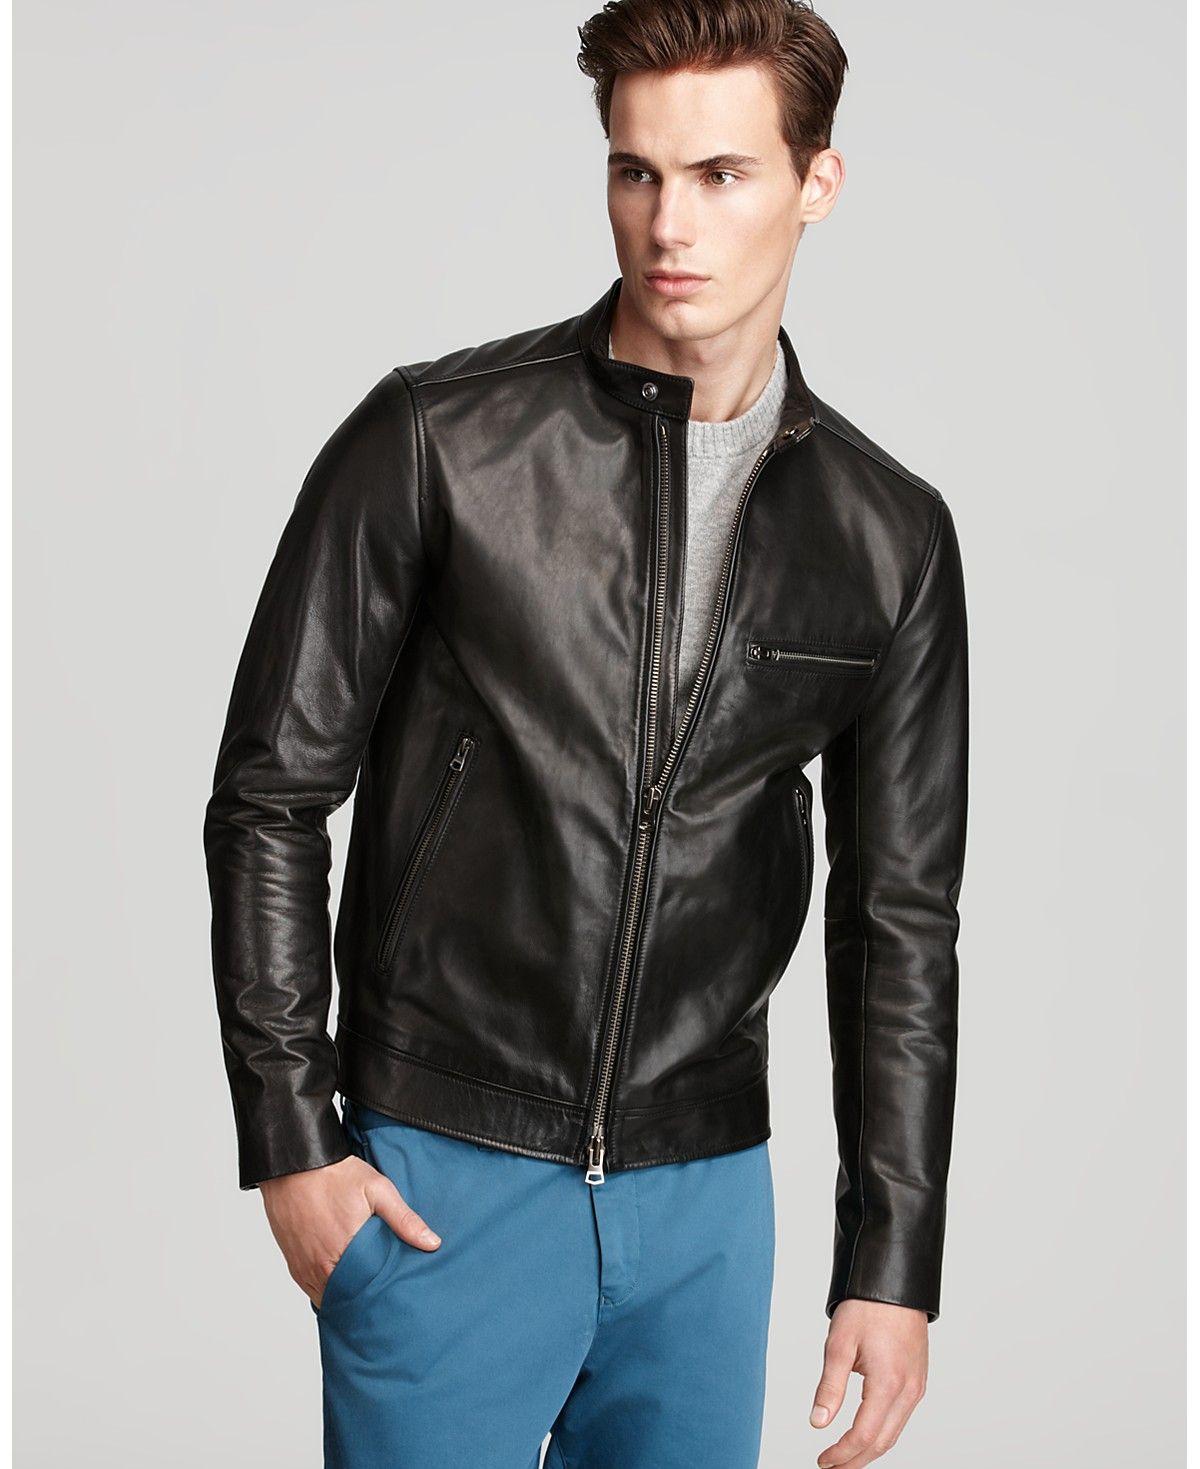 Theory Brome Karel Leather Jacket Men Coats Jackets Bloomingdale S Leather Jacket Jackets Leather Jacket Men [ 1469 x 1200 Pixel ]